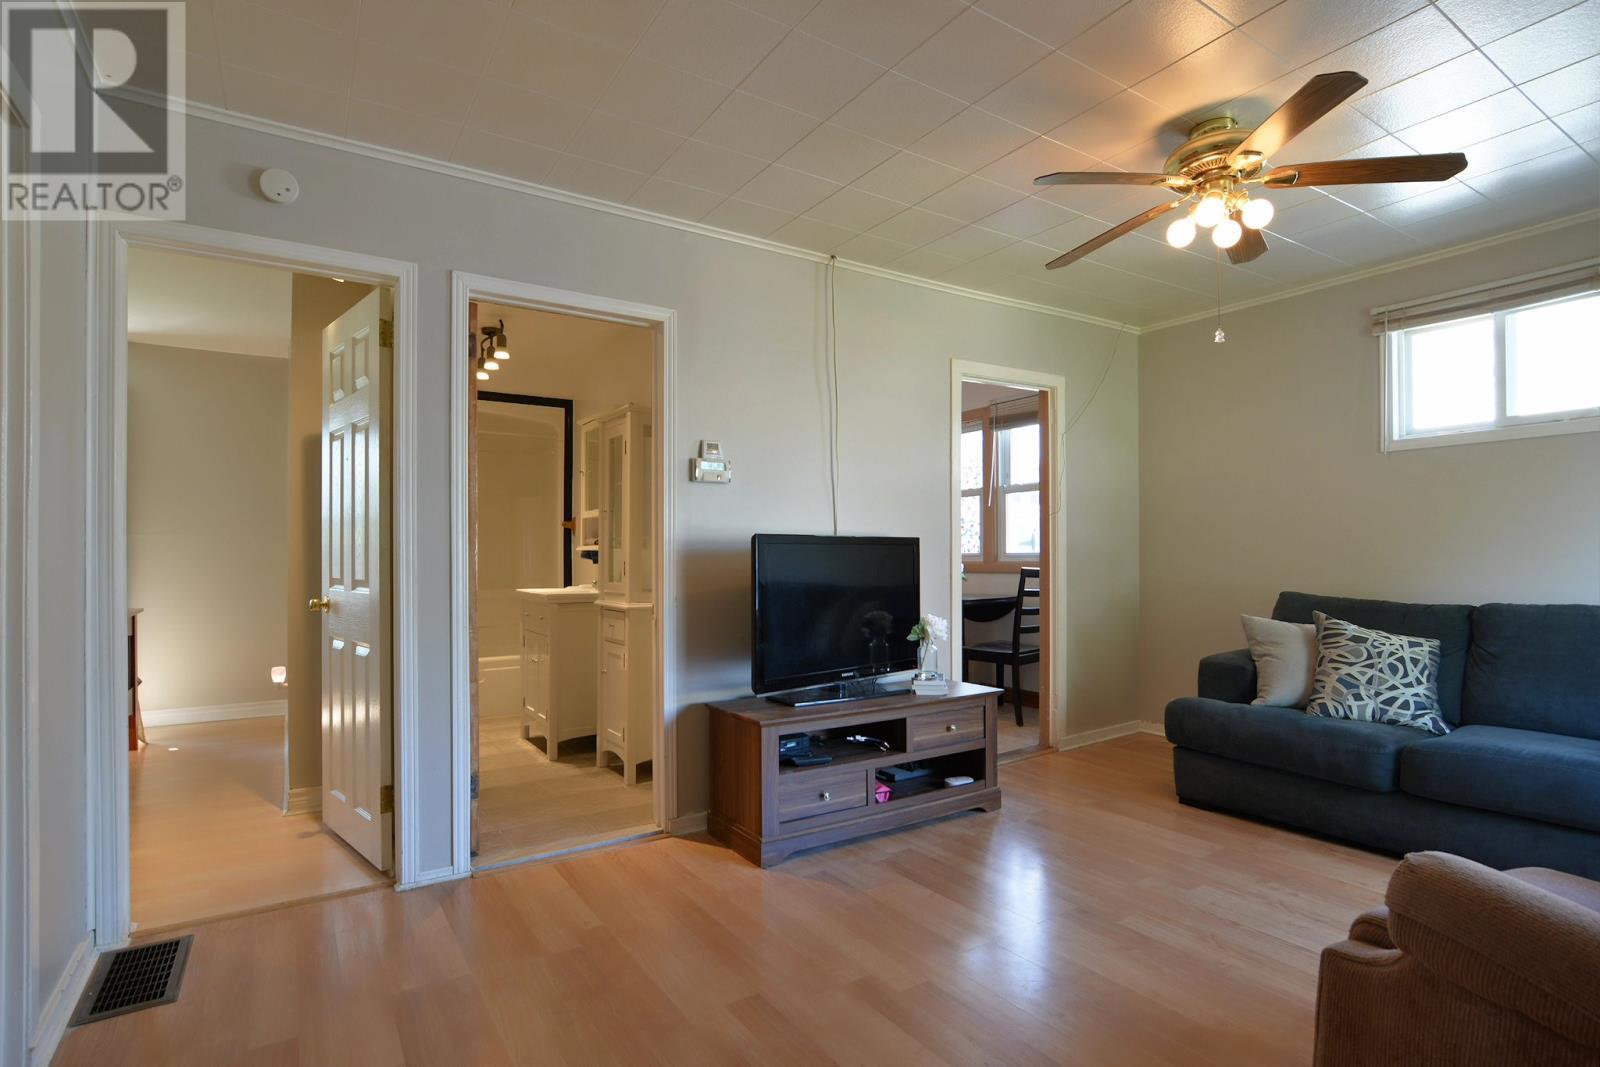 Single Room For Rent In Windsor